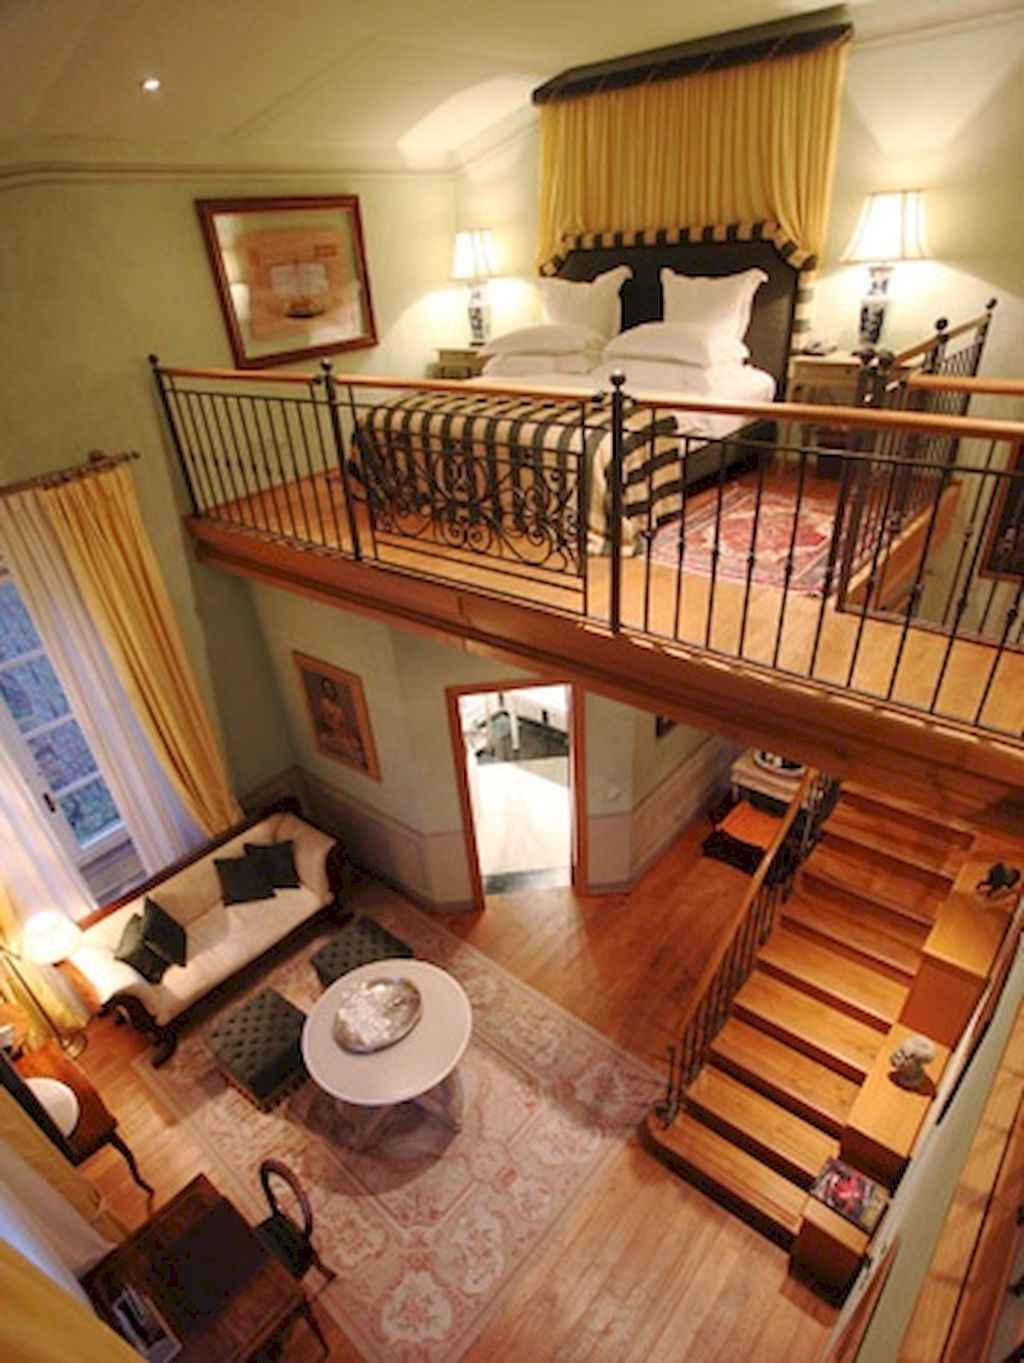 Cool creative loft apartment decorating ideas (6)